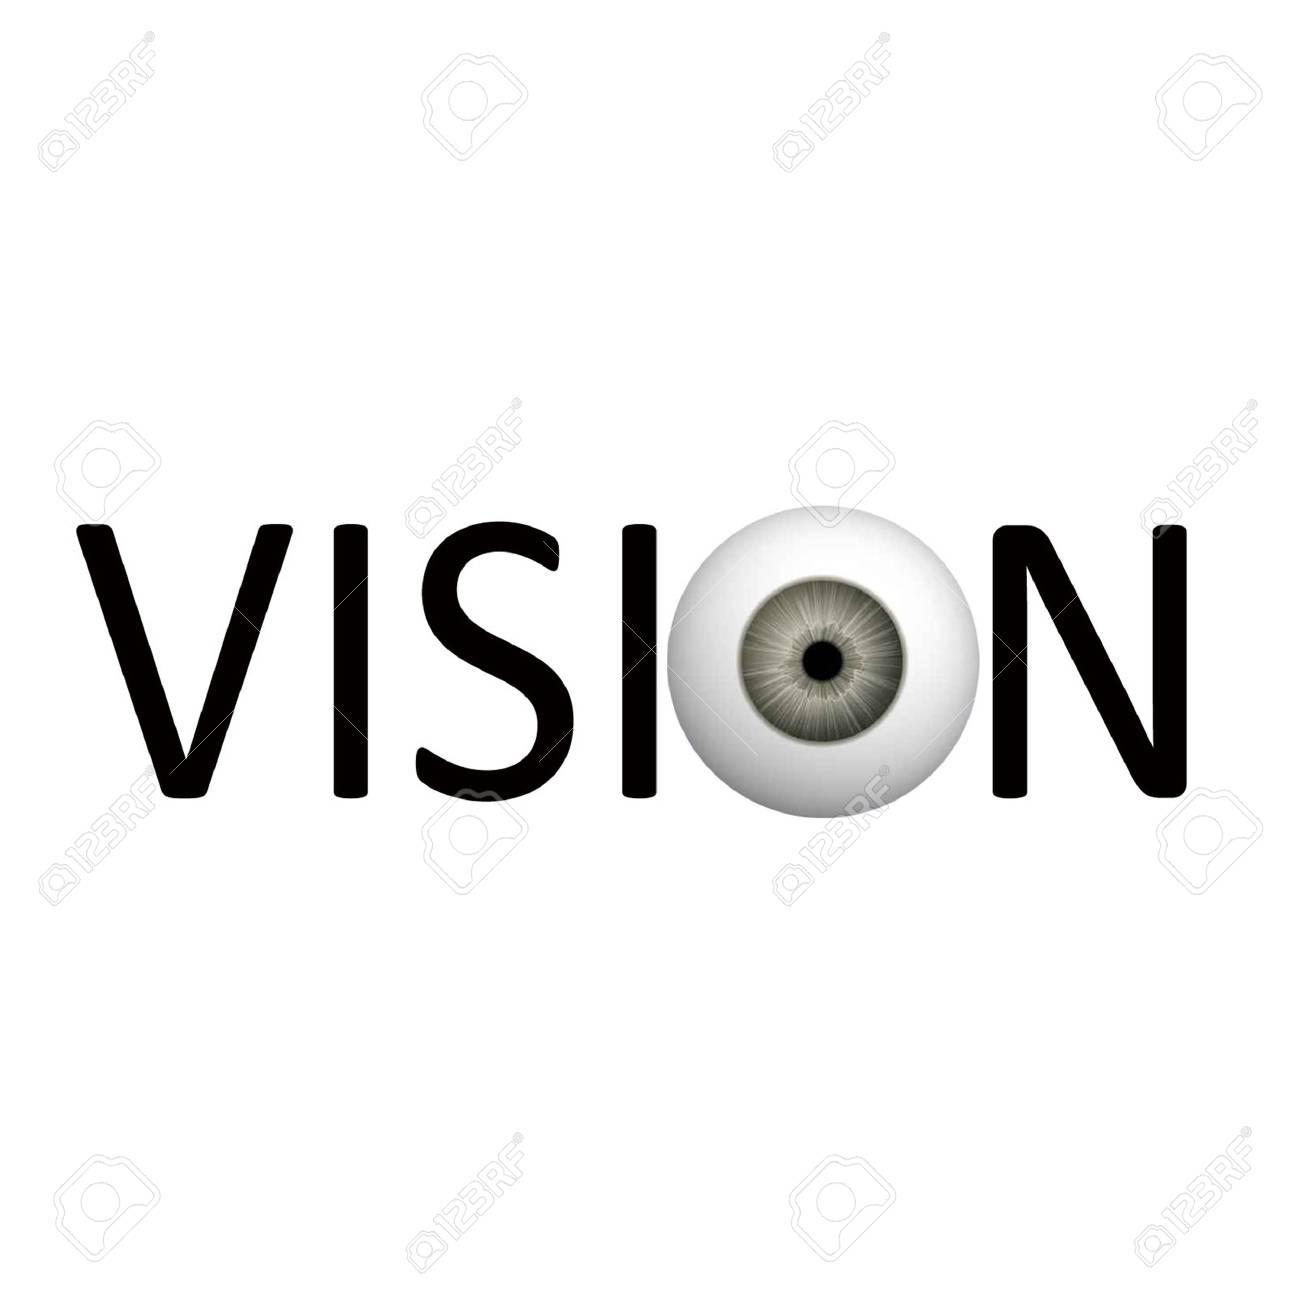 Vision - 19396594